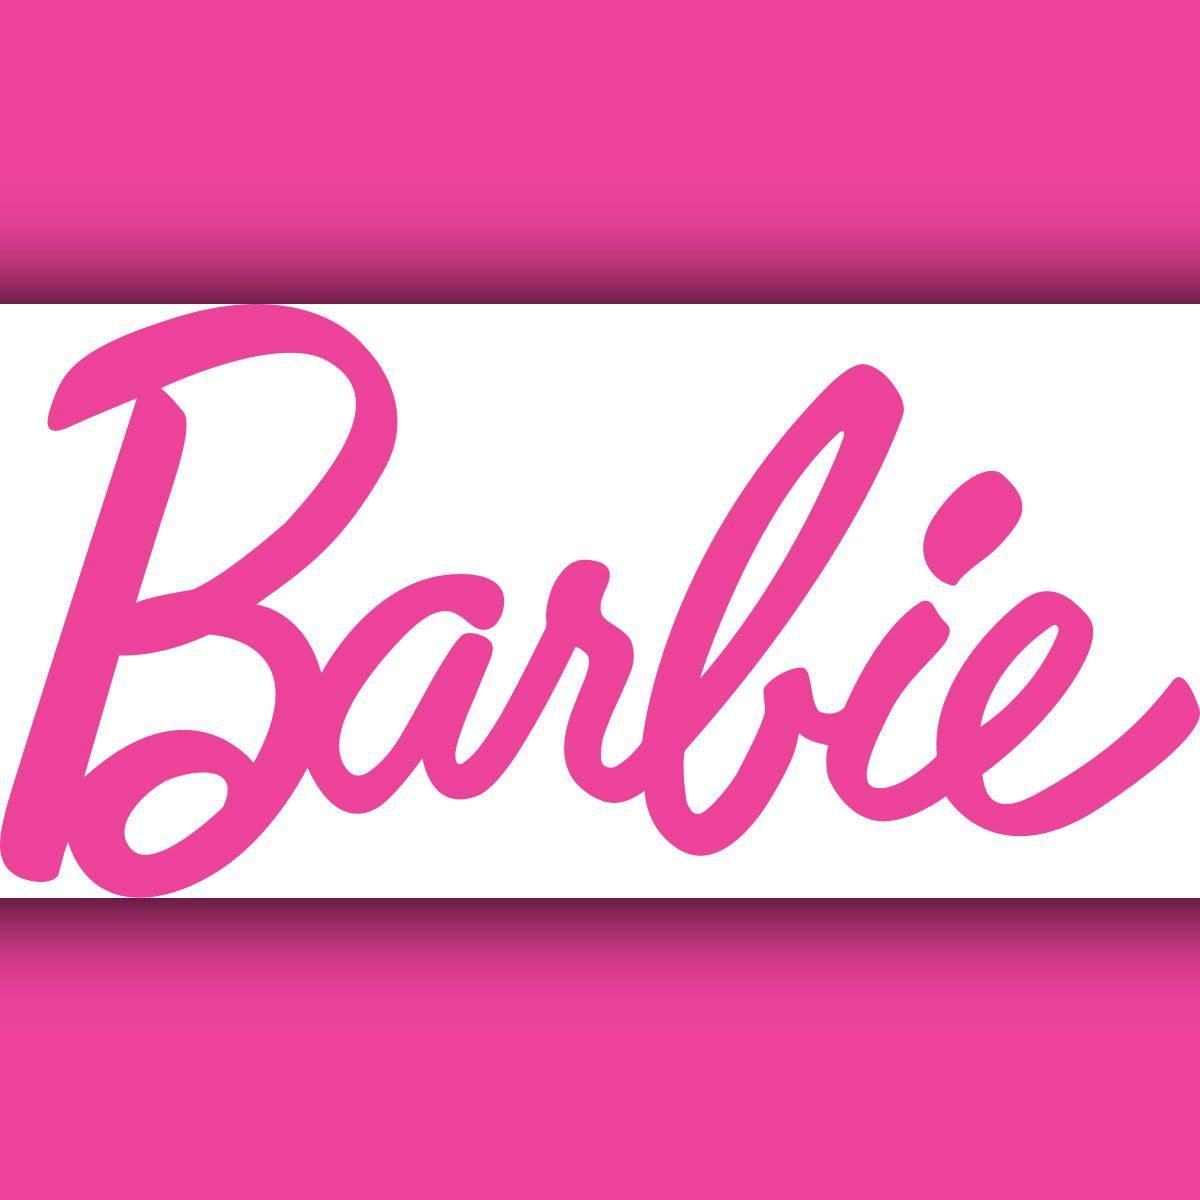 Barbie doll logo